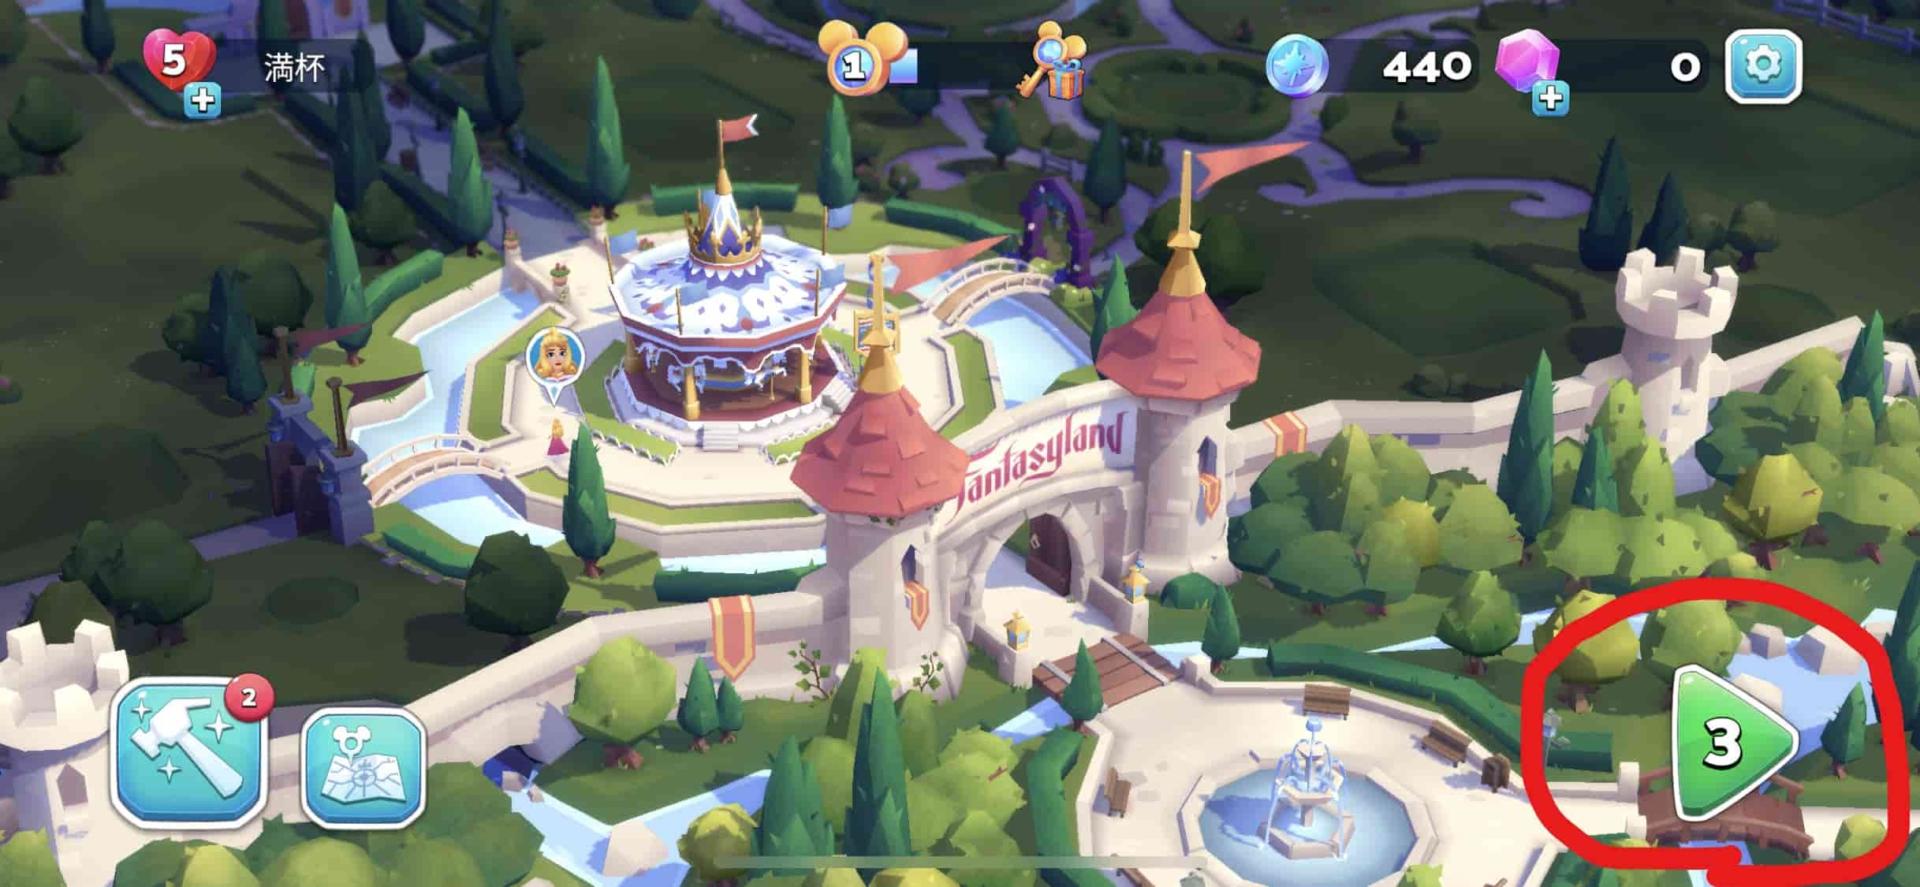 Disney Wonderful Worldsの序盤攻略